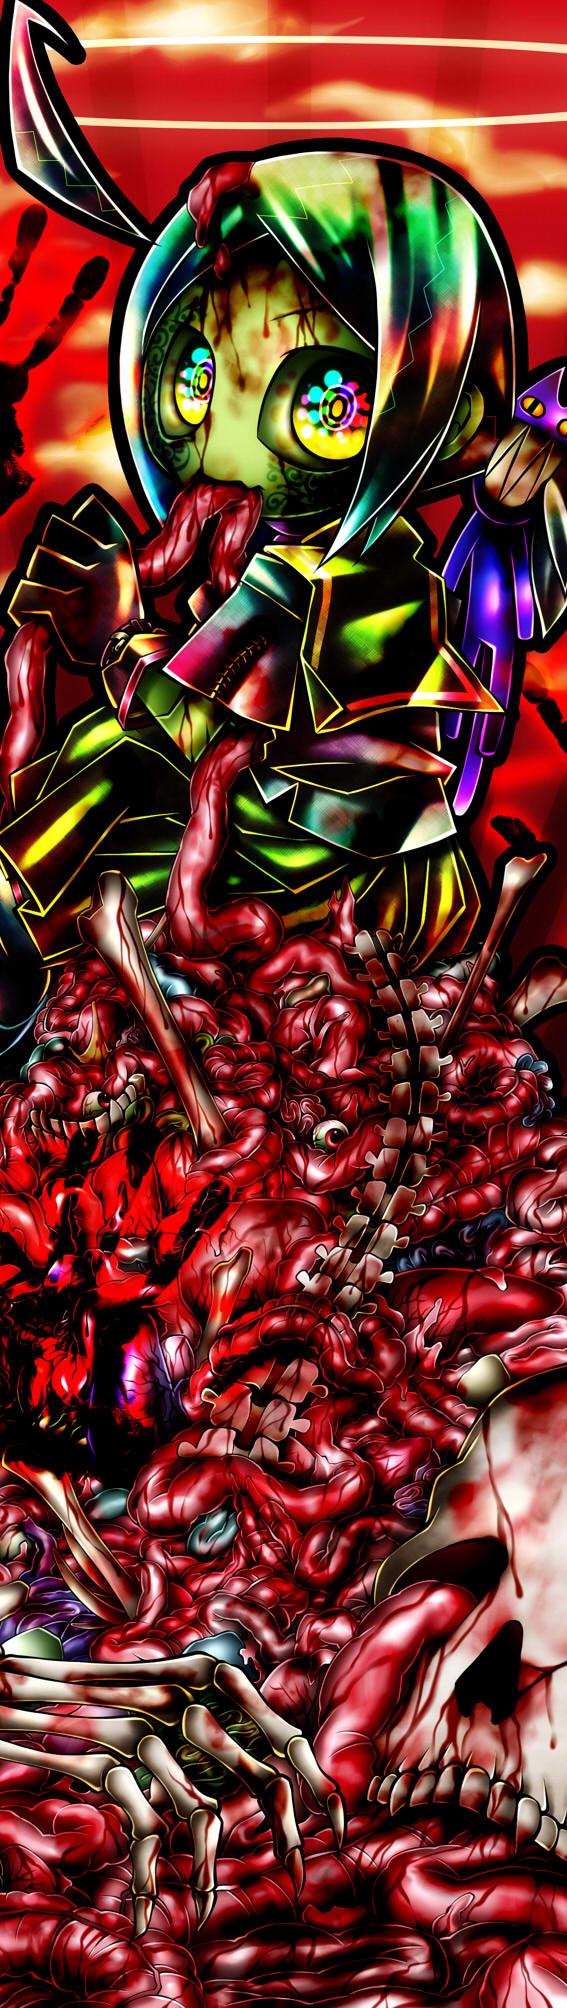 kerberoz general again nipples damn thread image xxxviii there random